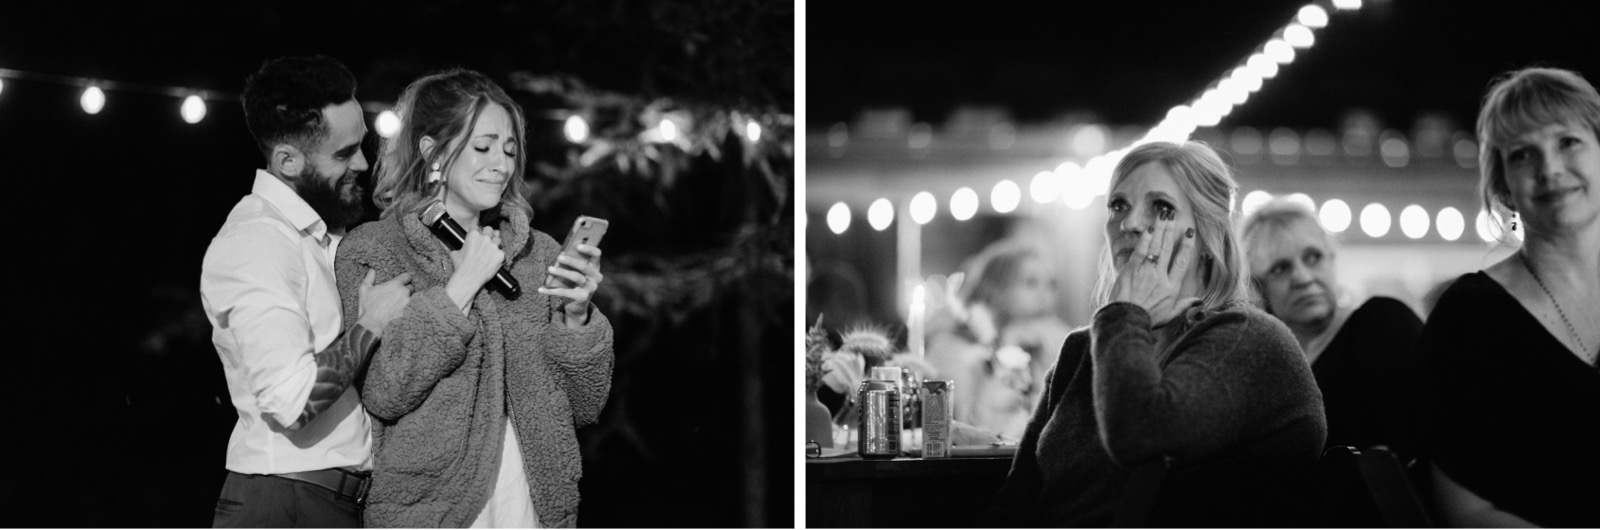 122_Emily & Jeff Wedding 1055_Emily & Jeff Wedding 1057_the-waterfall-lodge_forest_wedding_ben-lomond_intimate